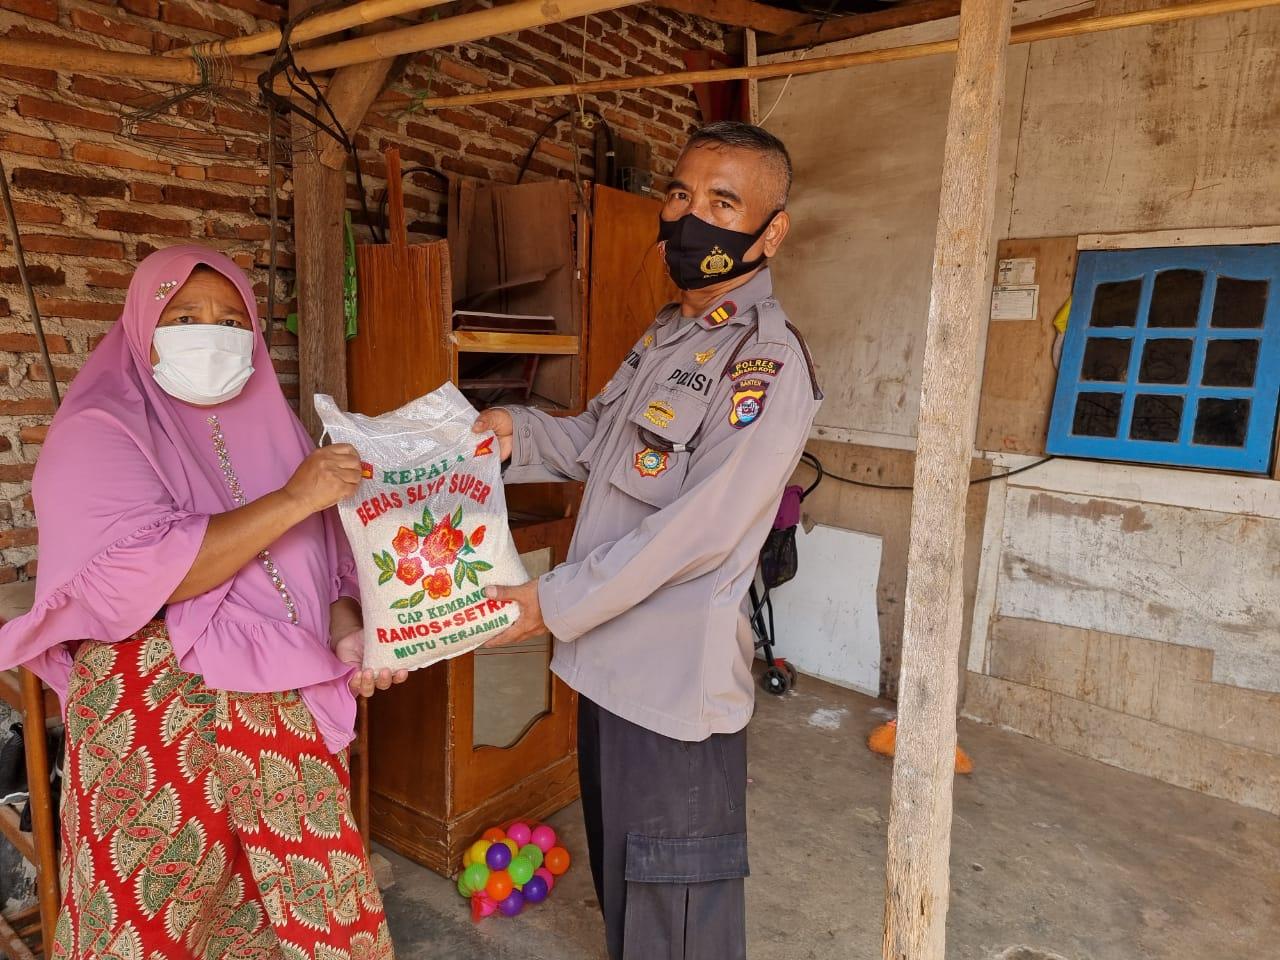 Gambar Kapolsek Kramatwatu Bagikan Beras ke Masyarakat Terdampak Pandemi Covid-19 13